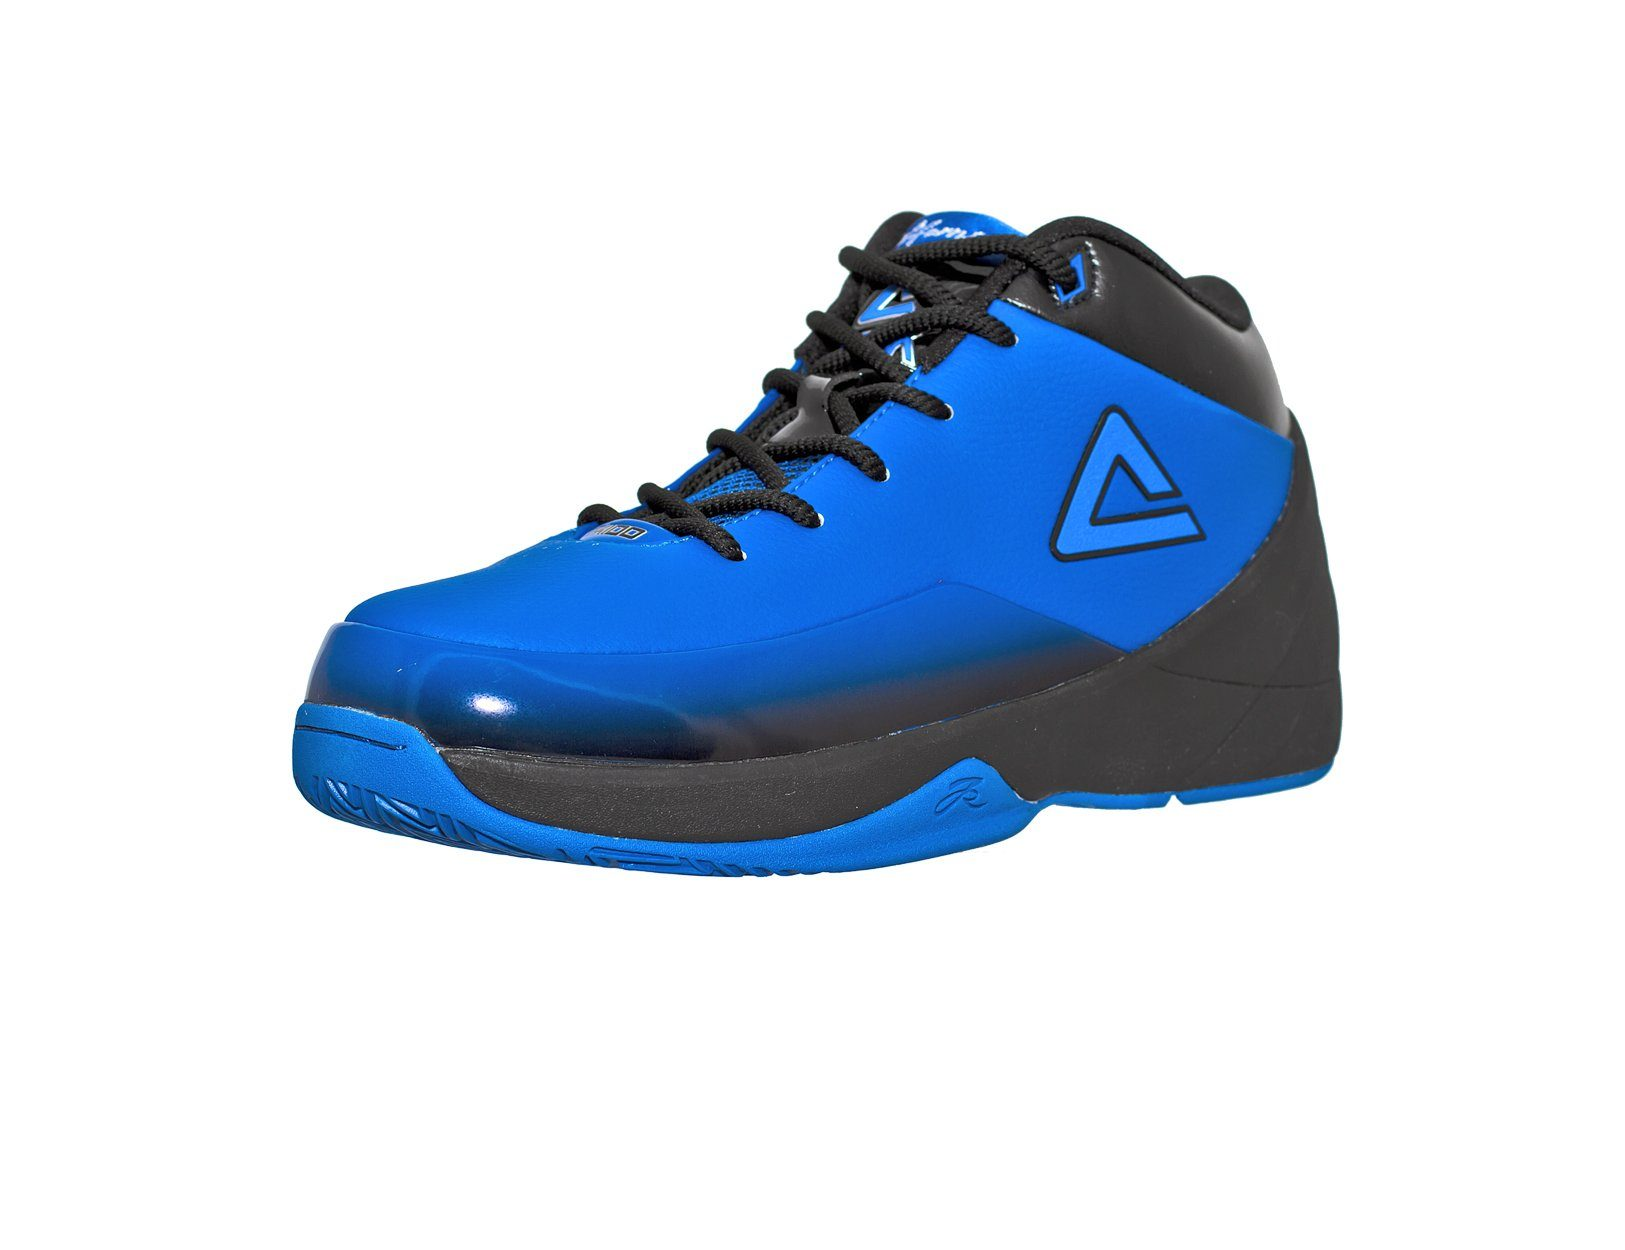 Unisex PEAK »Jason Kidd III Signature« Trainingsschuh mit Foot-Hold-System    04251021604913